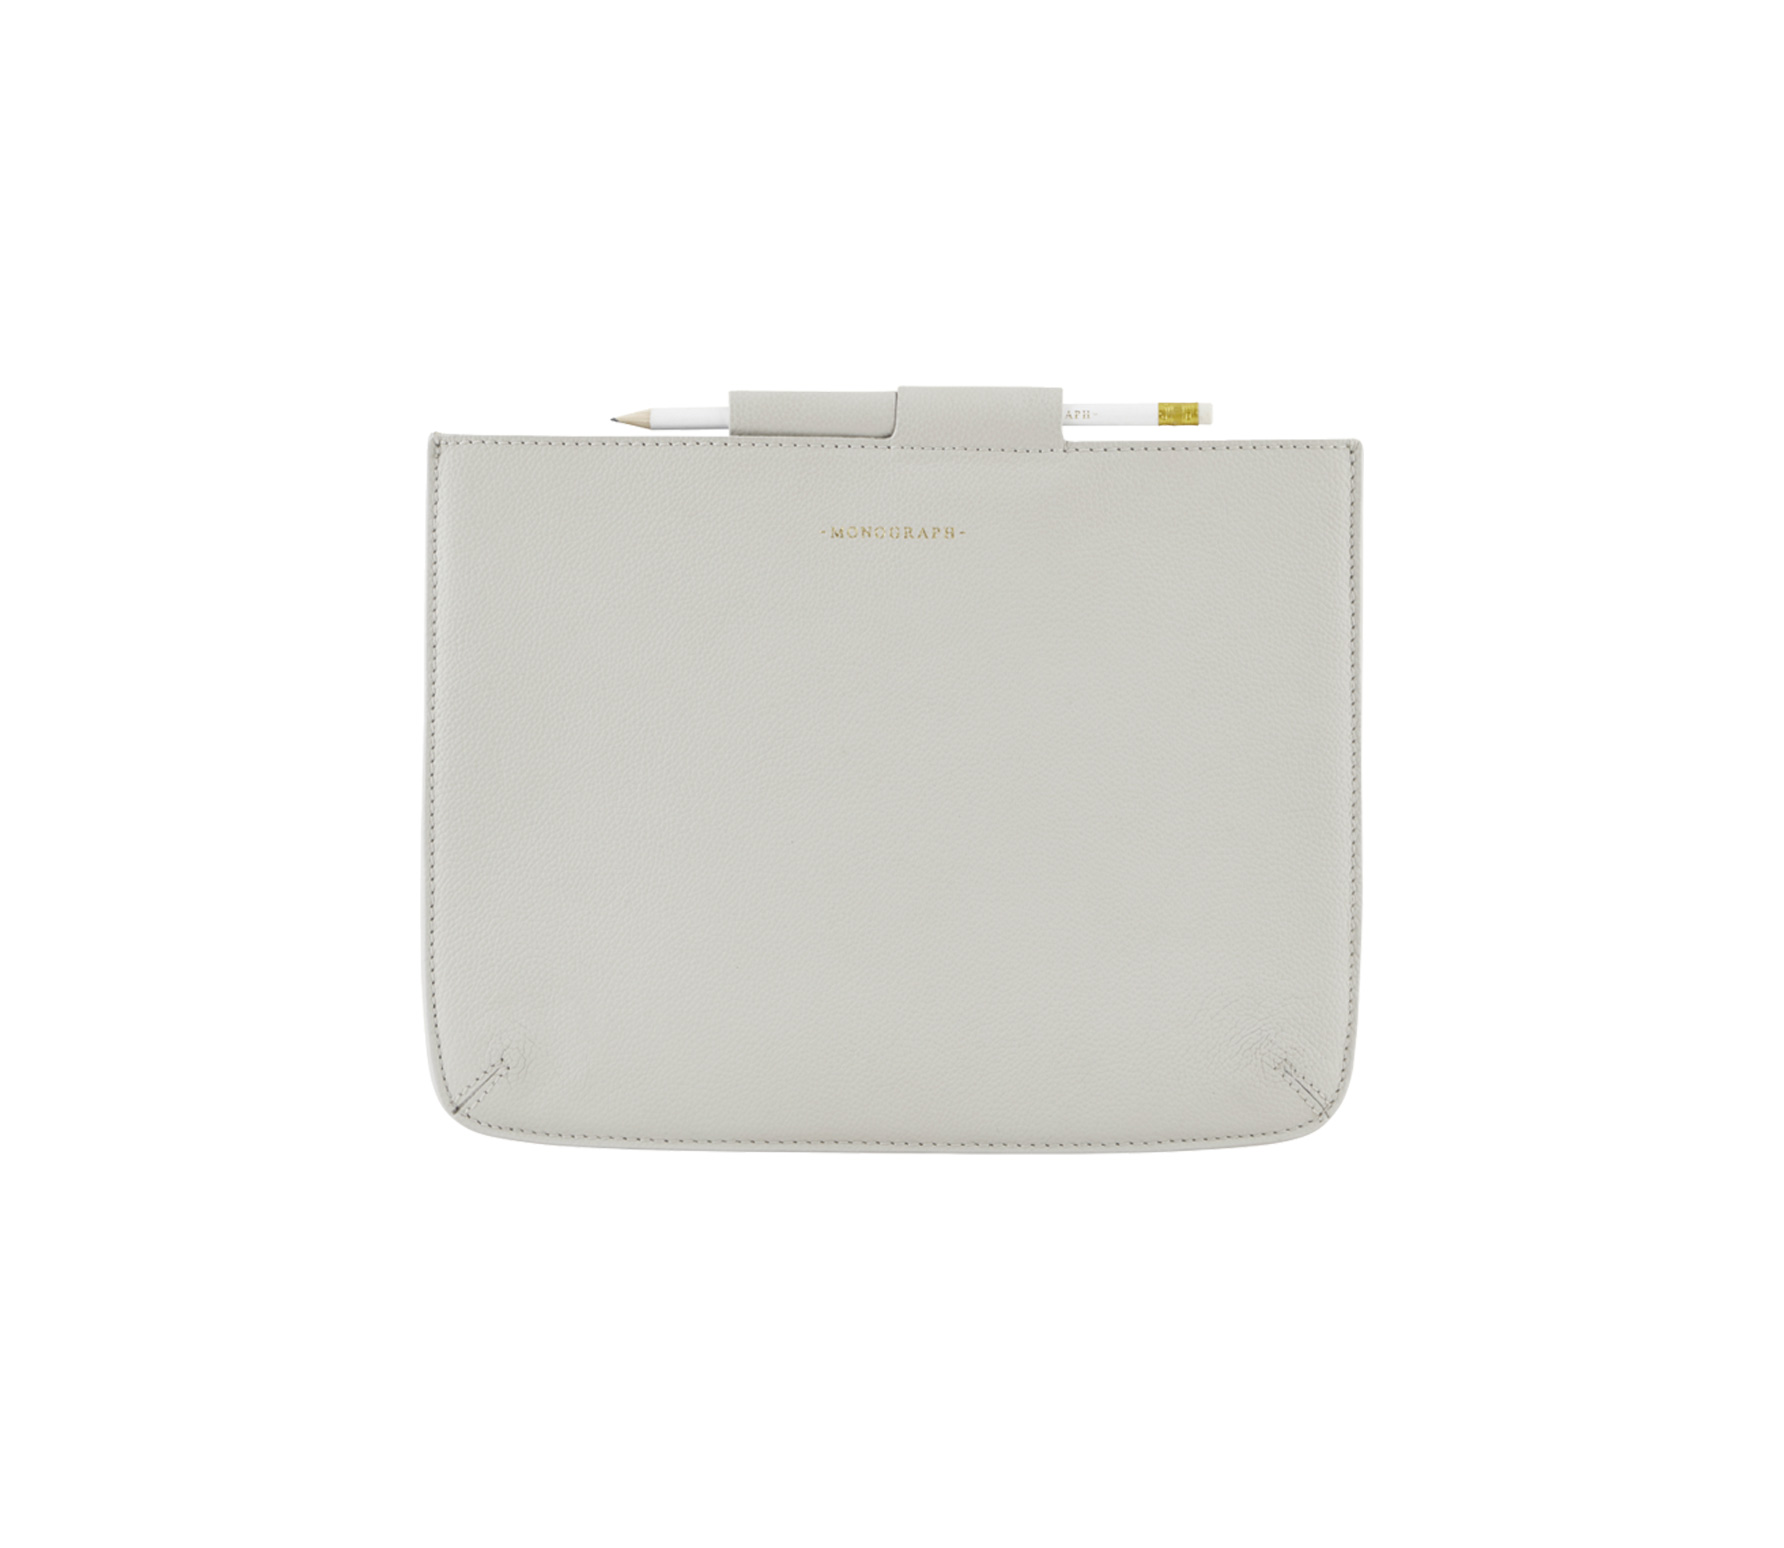 Housedoctor Cover iPad hoes leer grijs Pro 35,5 x 26,5 cm